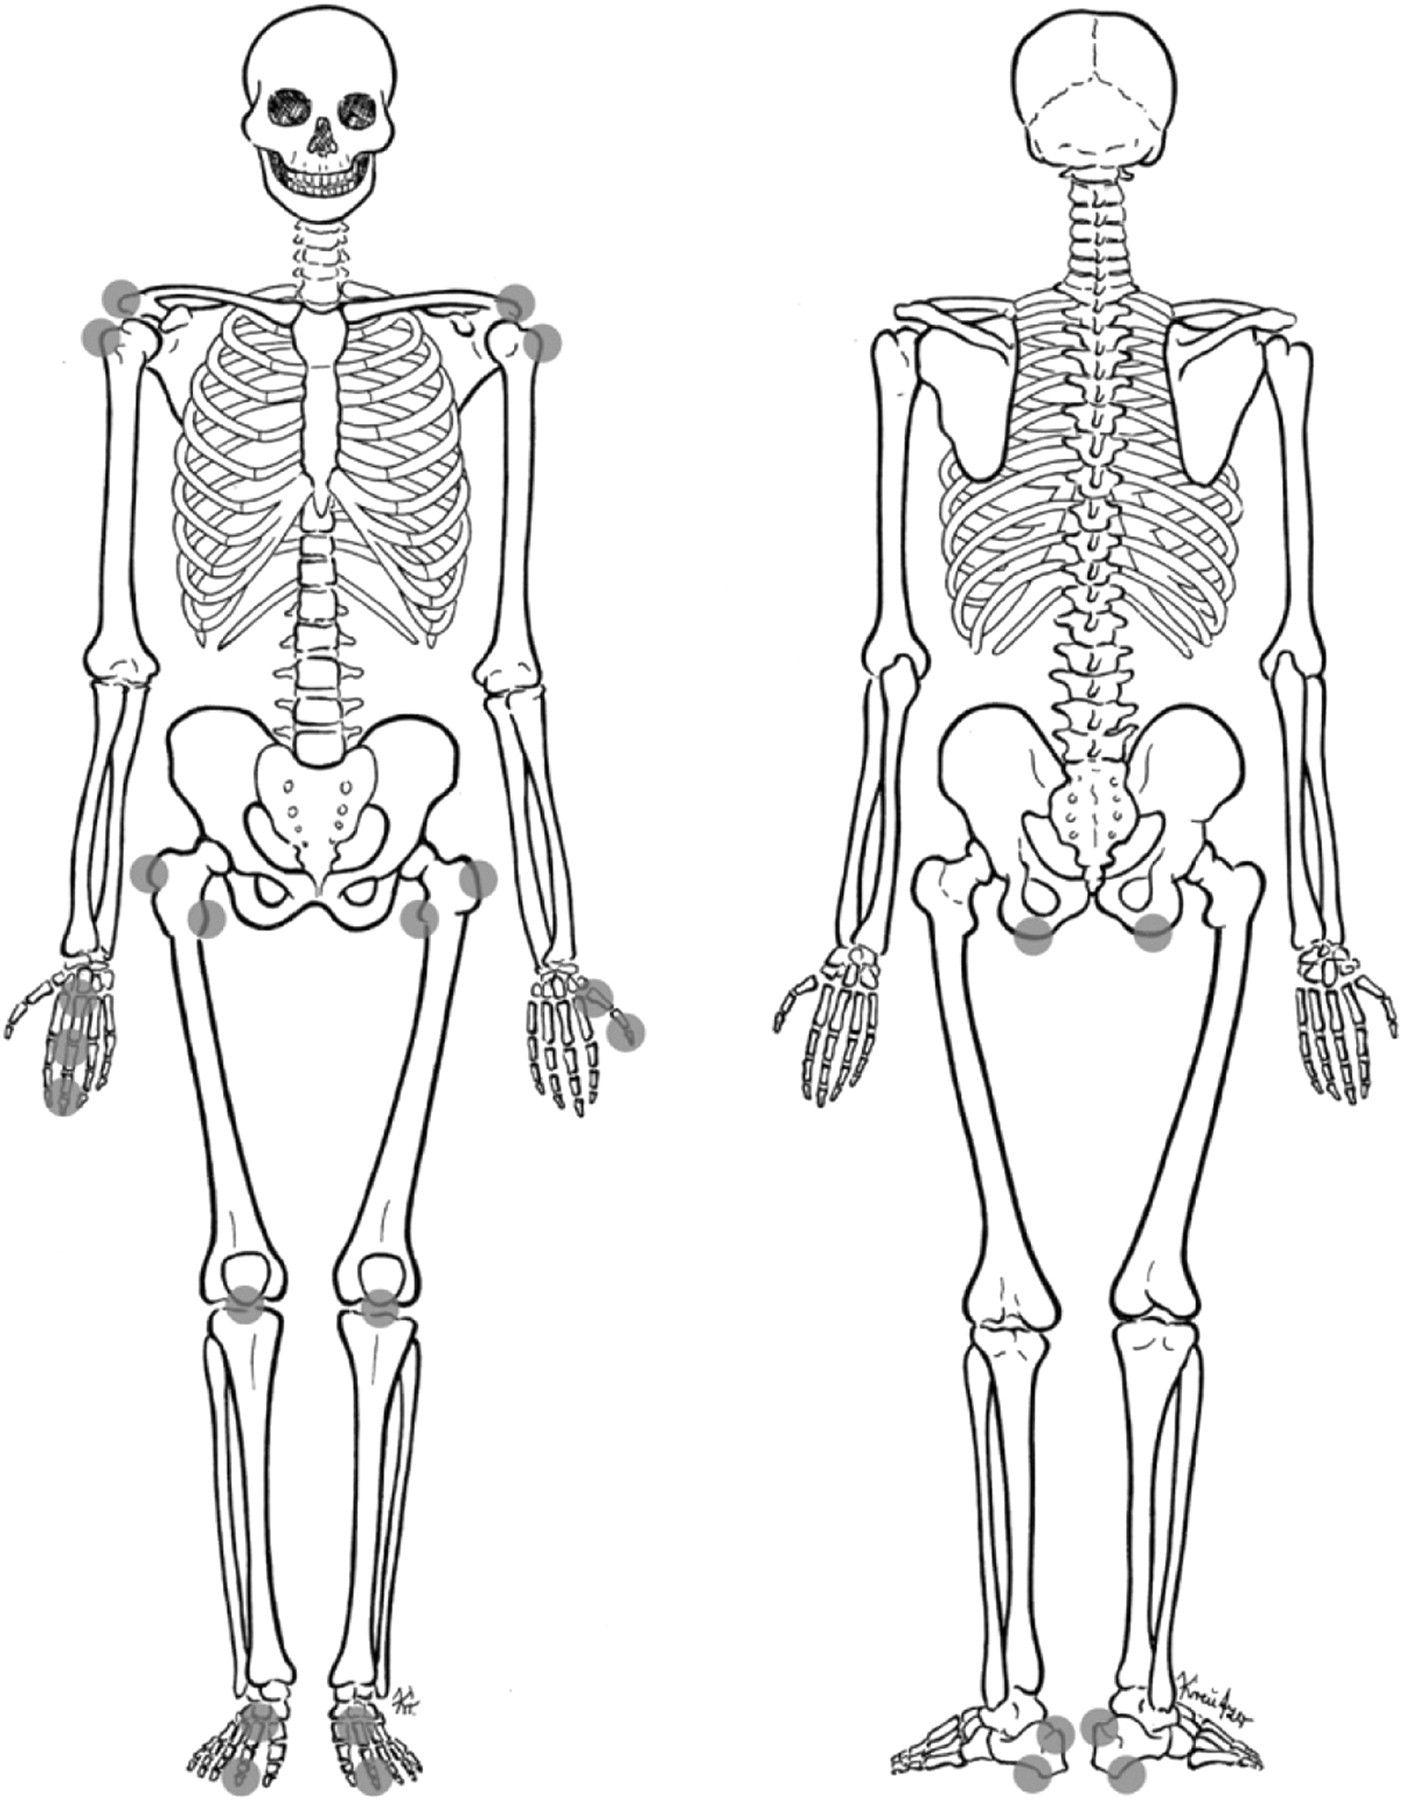 medium resolution of unlabeled human skeleton diagram unlabeled human skeleton diagram labeled diagram of skeletal system printable human